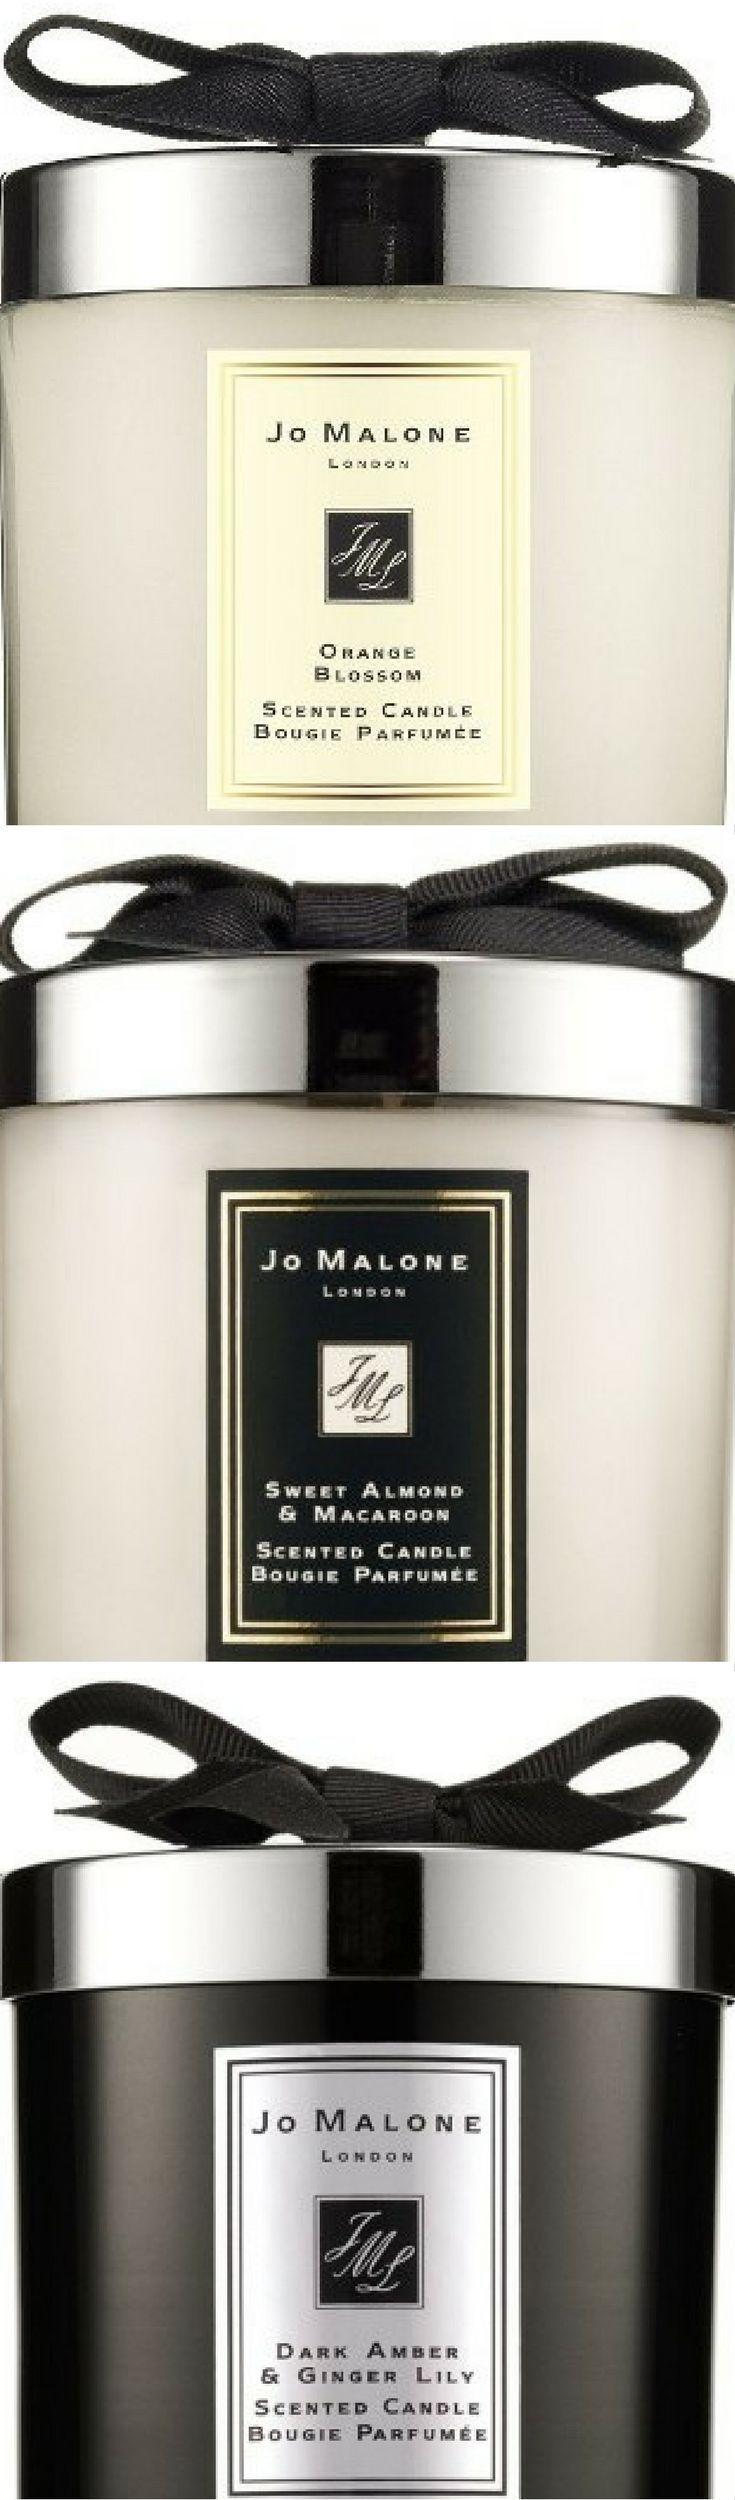 Jo Malone | Candle | Home | Decor | Large | Bathroom | Orange Blossom | Sponsored